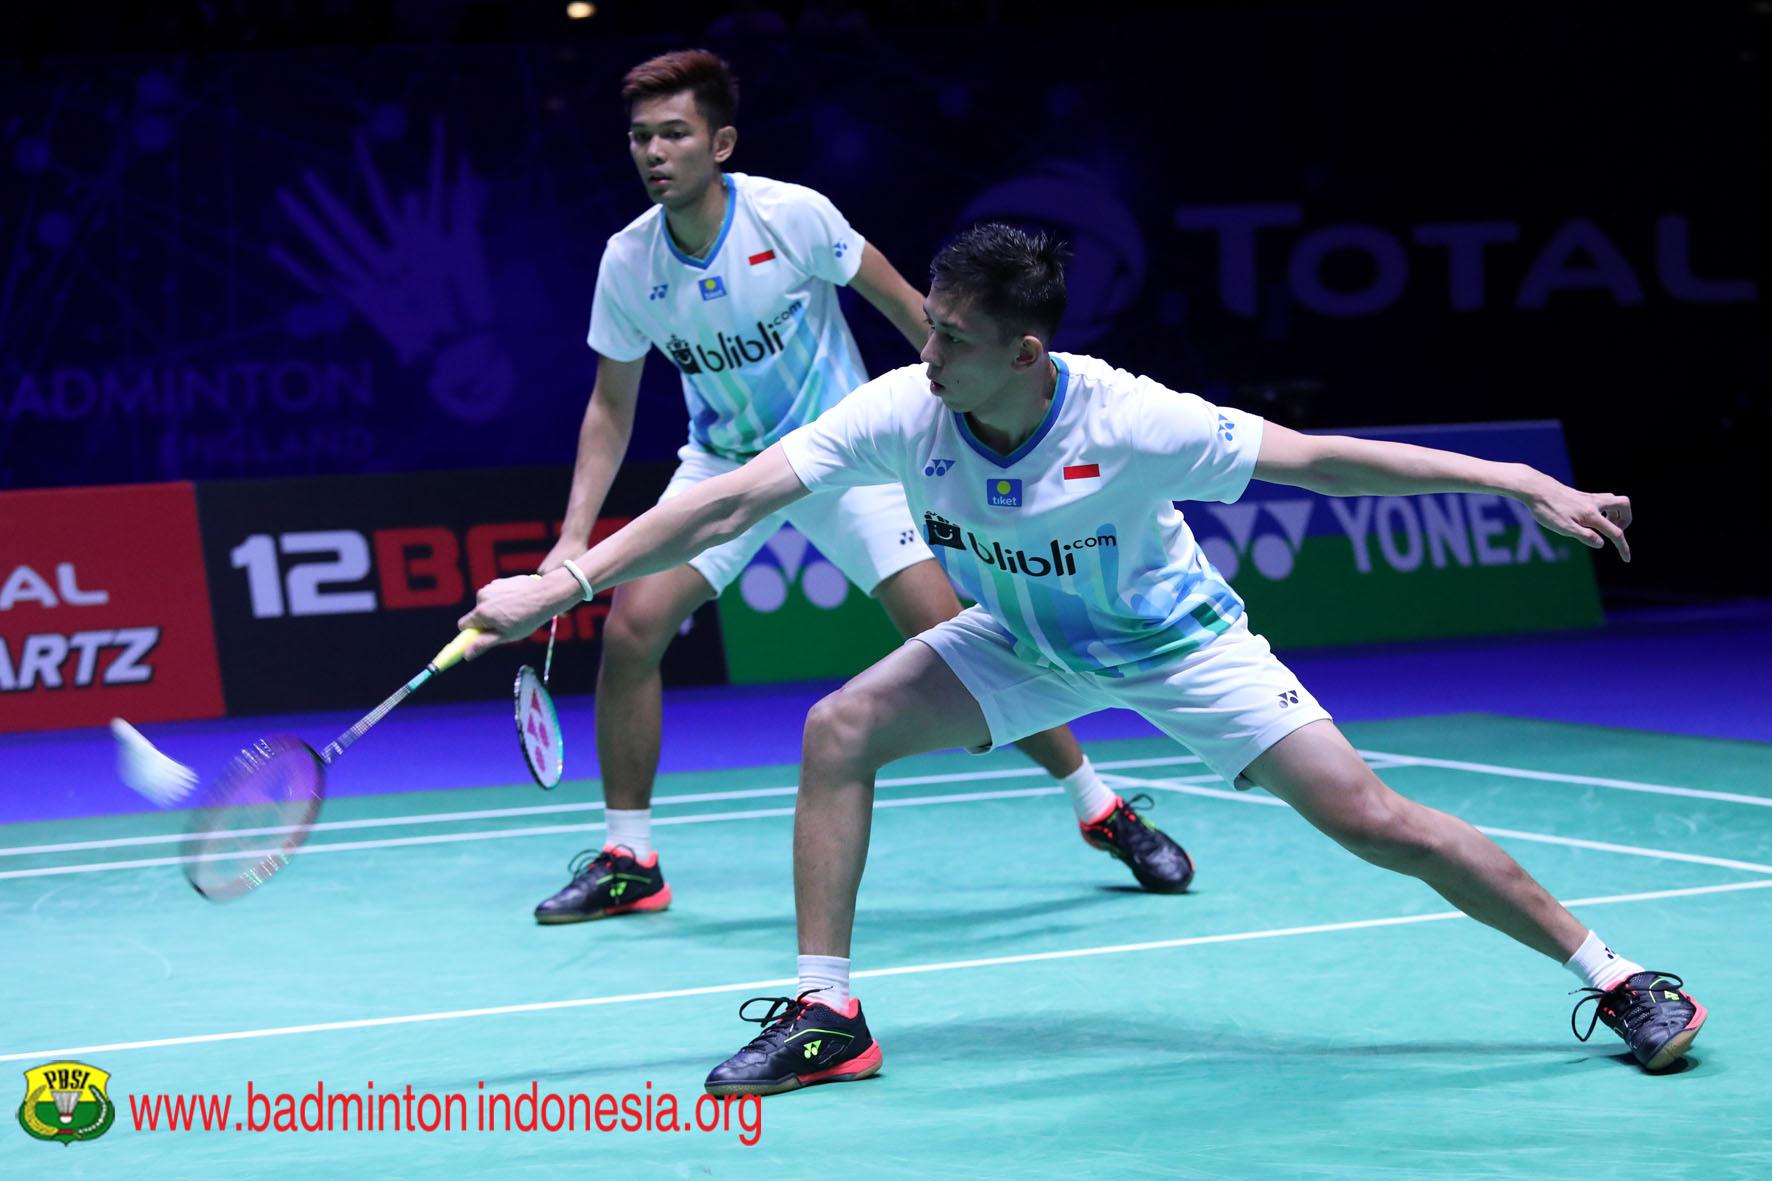 https: img-z.okeinfo.net content 2019 03 16 40 2030893 fajar-rian-hadapi-wakil-inggris-di-semifinal-swiss-open-2019-1T4LpkhsFc.jpg